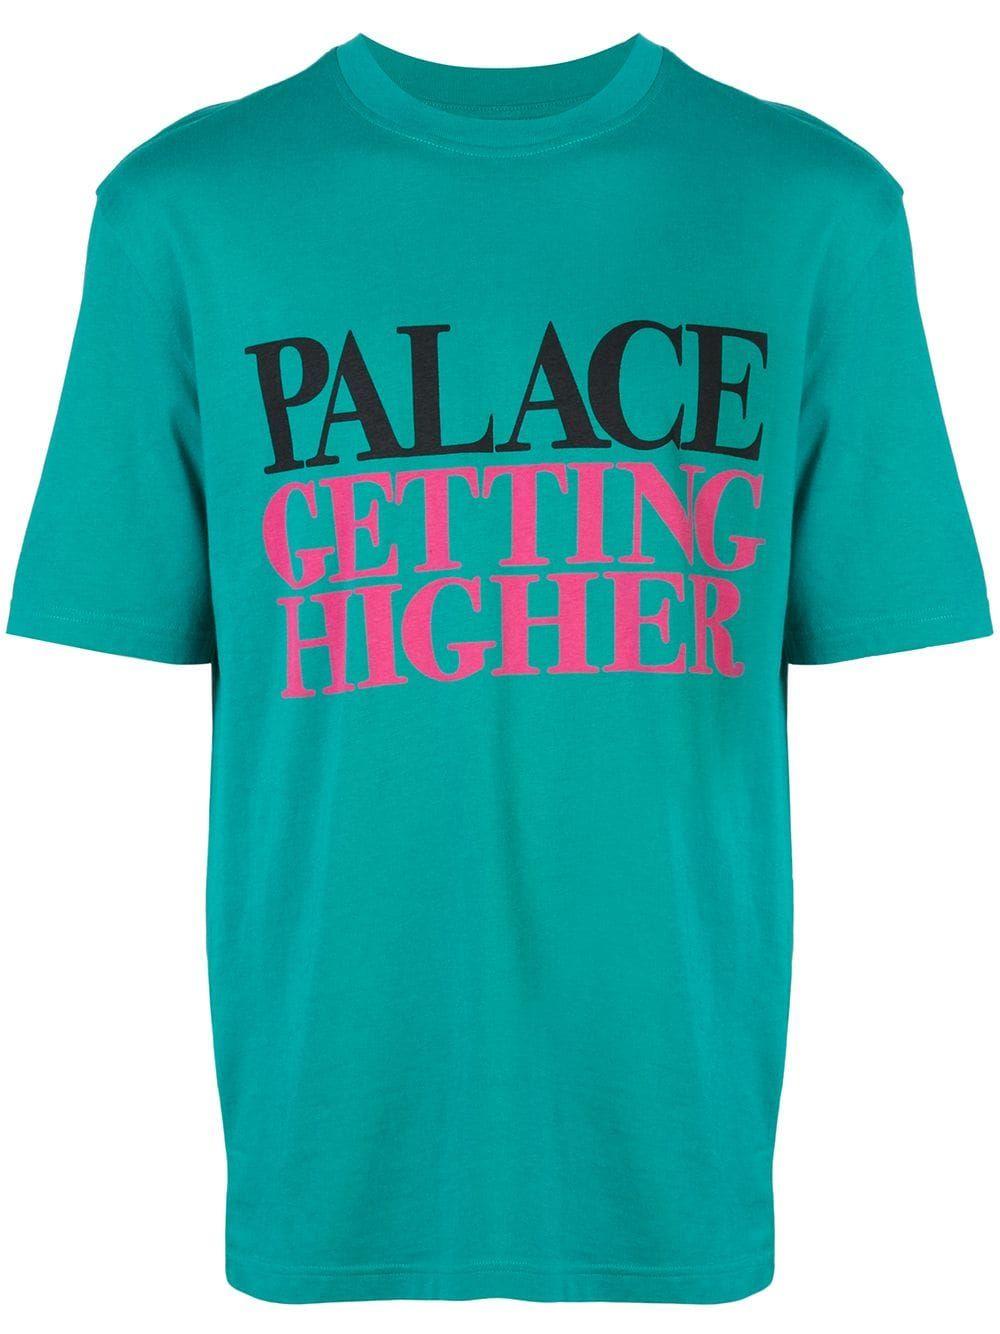 Palace Getting Higher T Shirt Farfetch T Shirt Shirts Shirt Designs